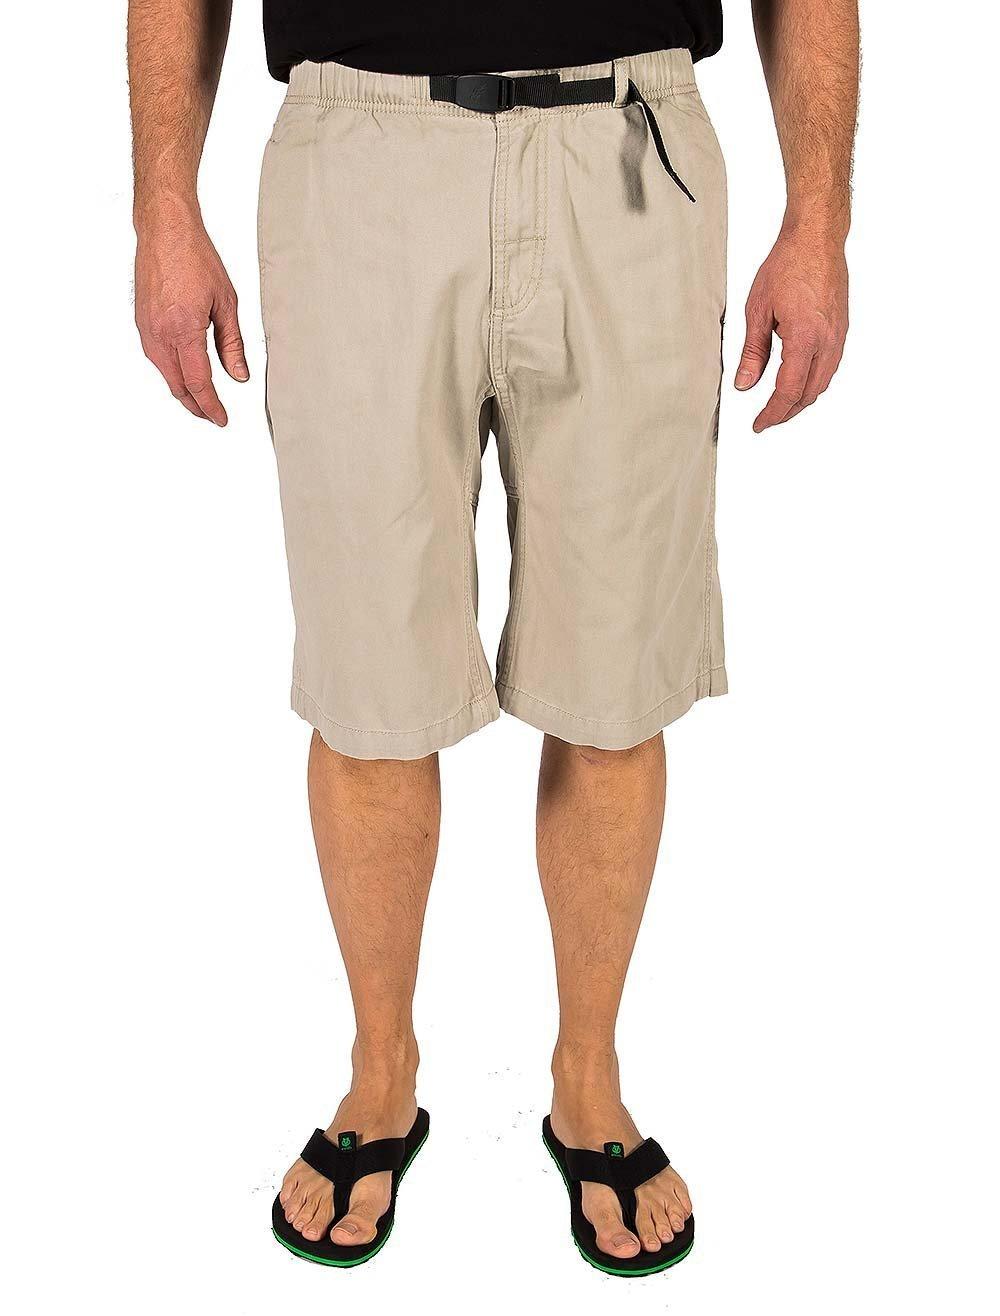 Gramicci Men's Rockin Sport Shorts, Old